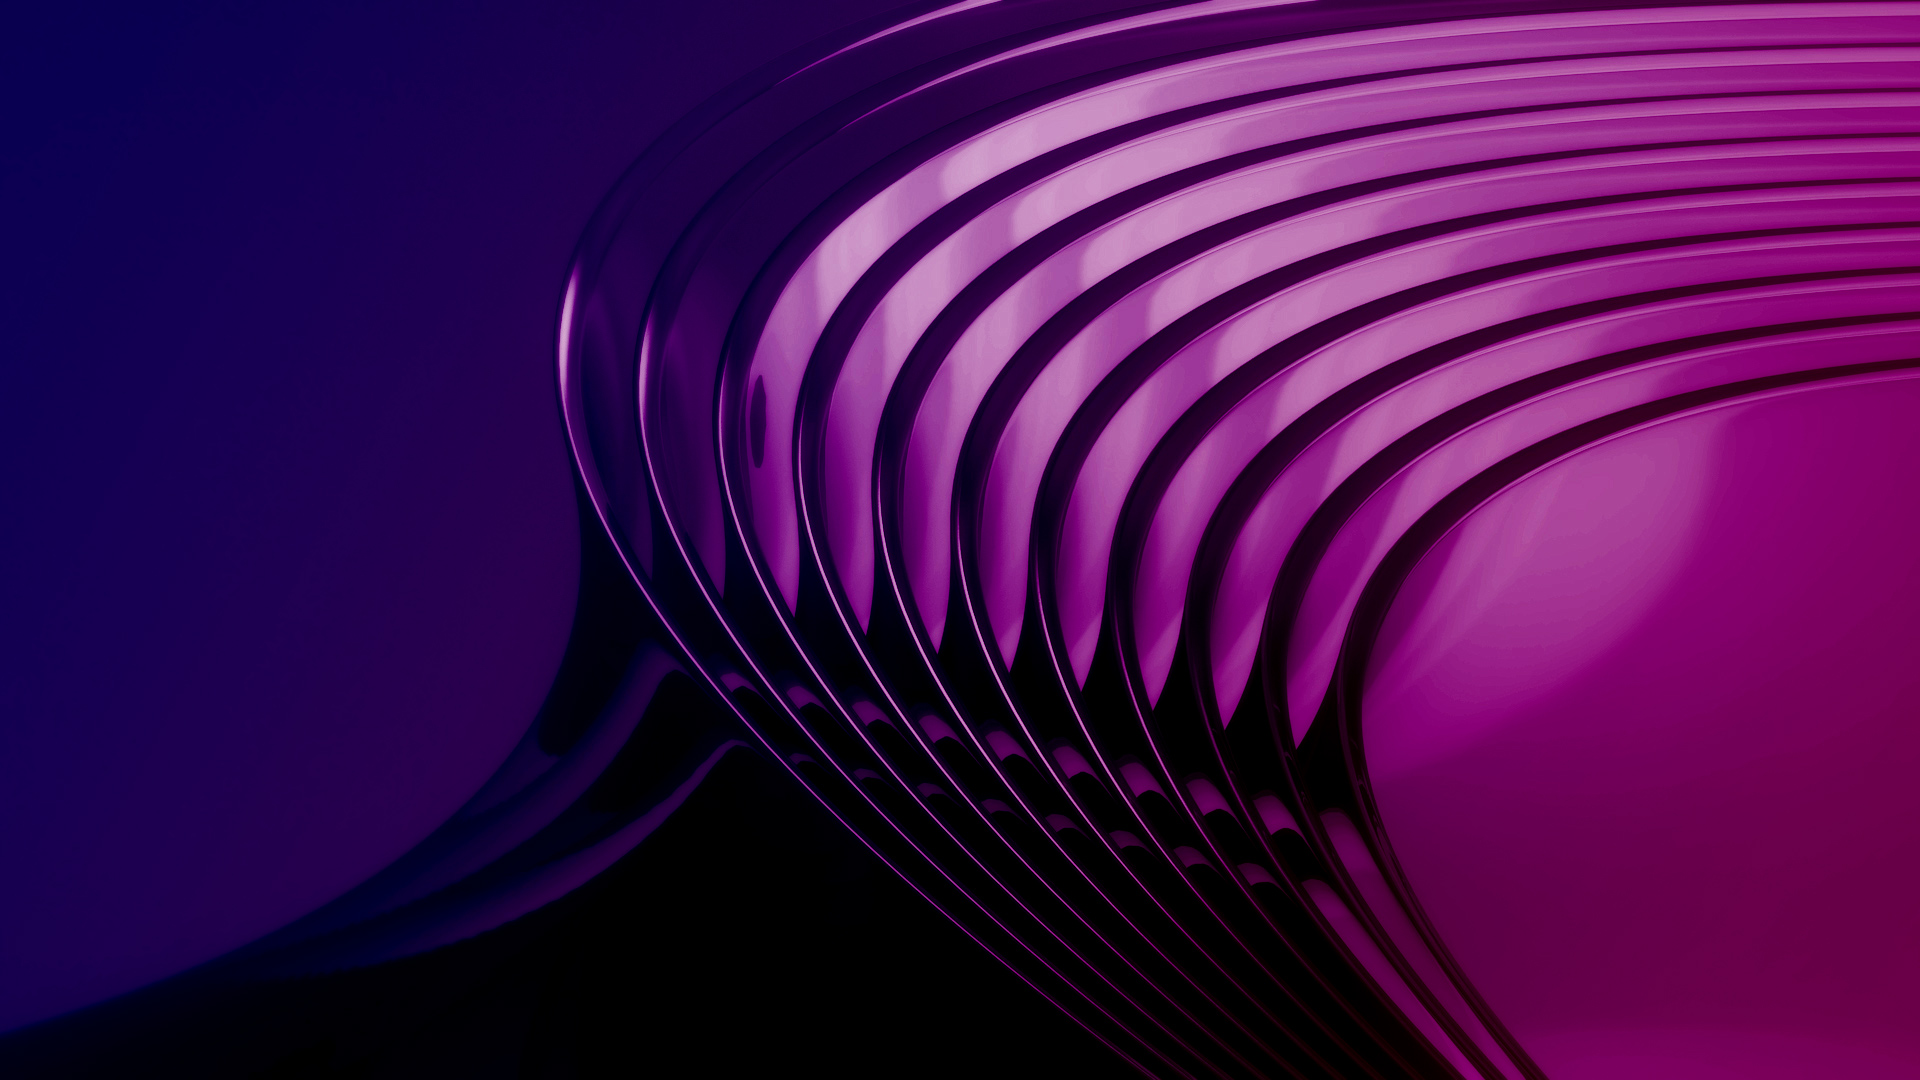 Crystal Shapes Abstract 3 Hd Abstract 4k Wallpapers